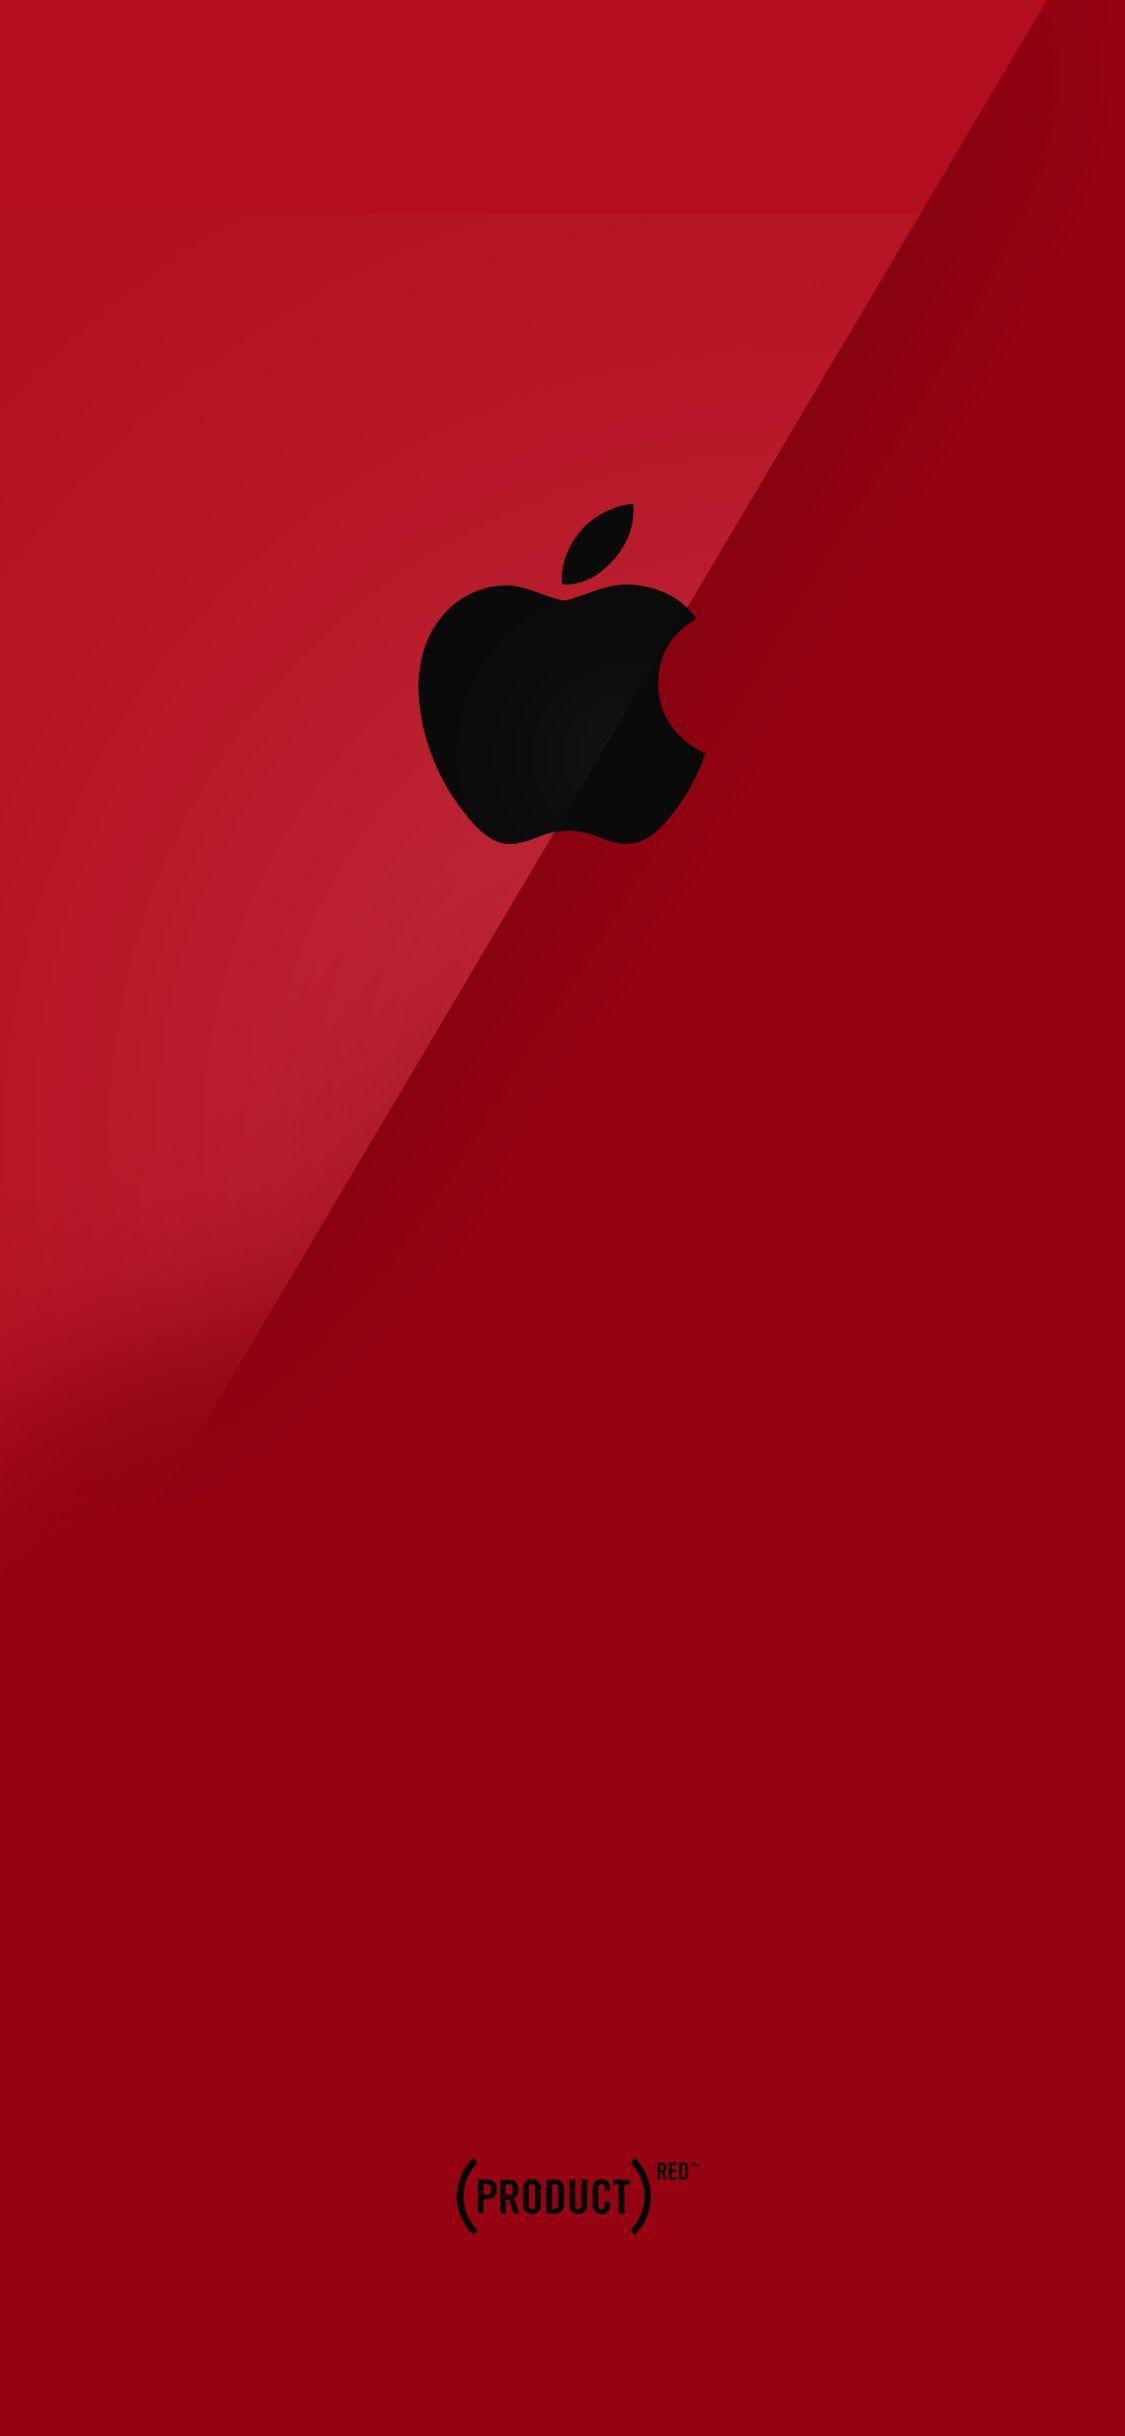 Red Apple Logo Wallpaper : apple, wallpaper, Apple, Wallpapers, Backgrounds, WallpaperAccess